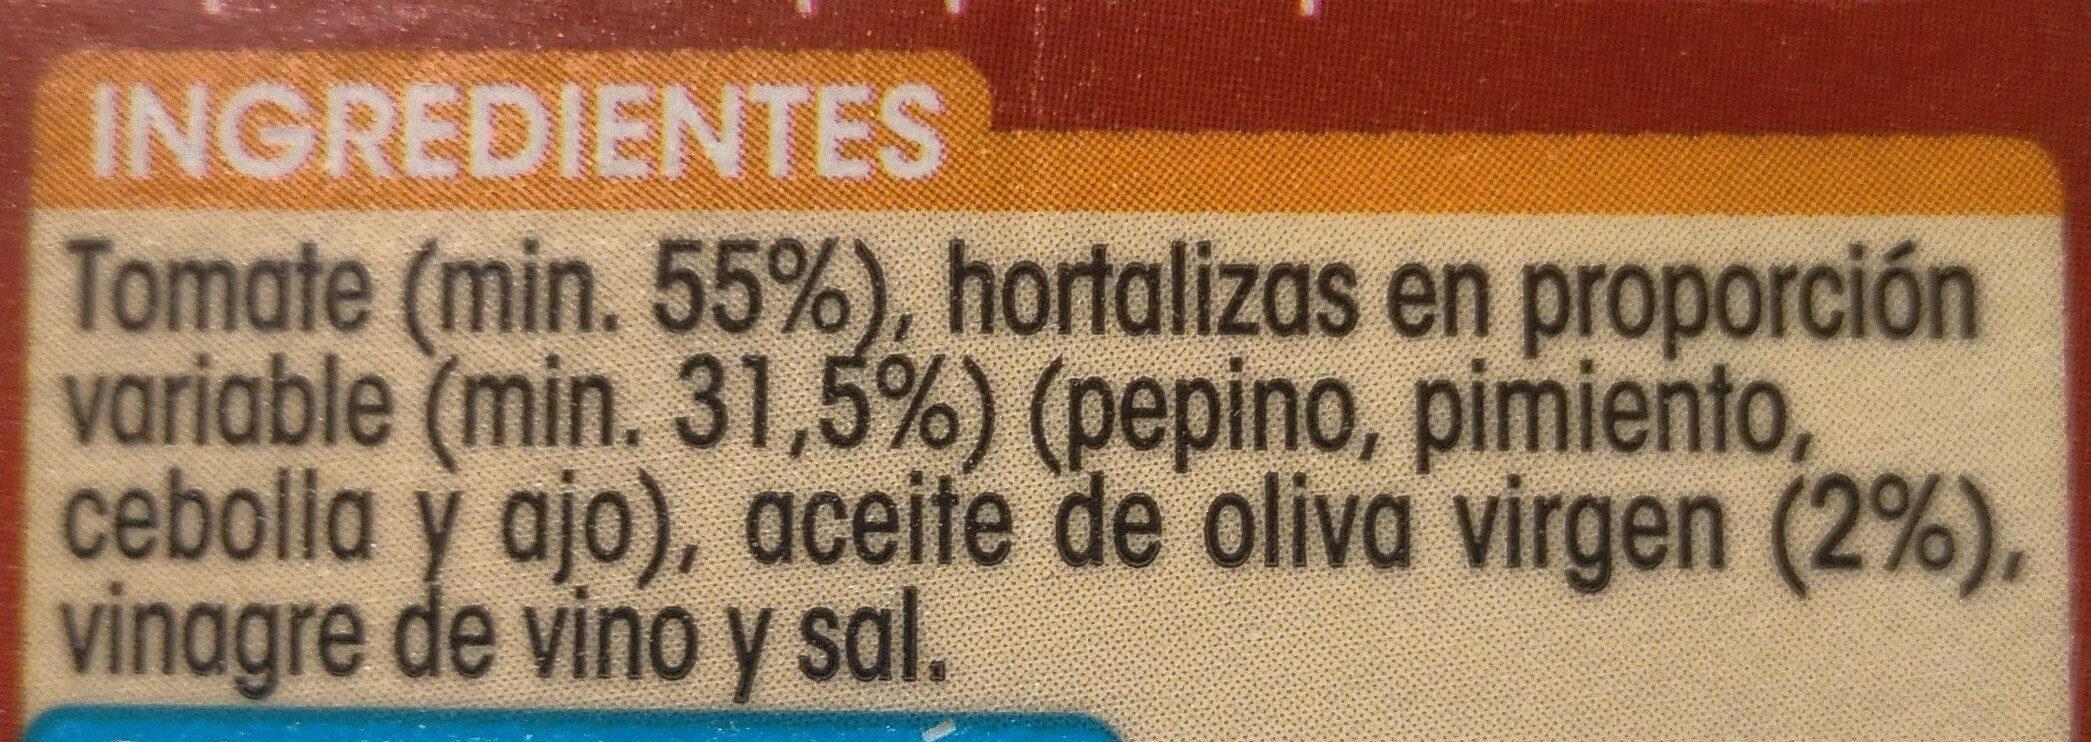 Gazpacho alipende - Ingredientes - es